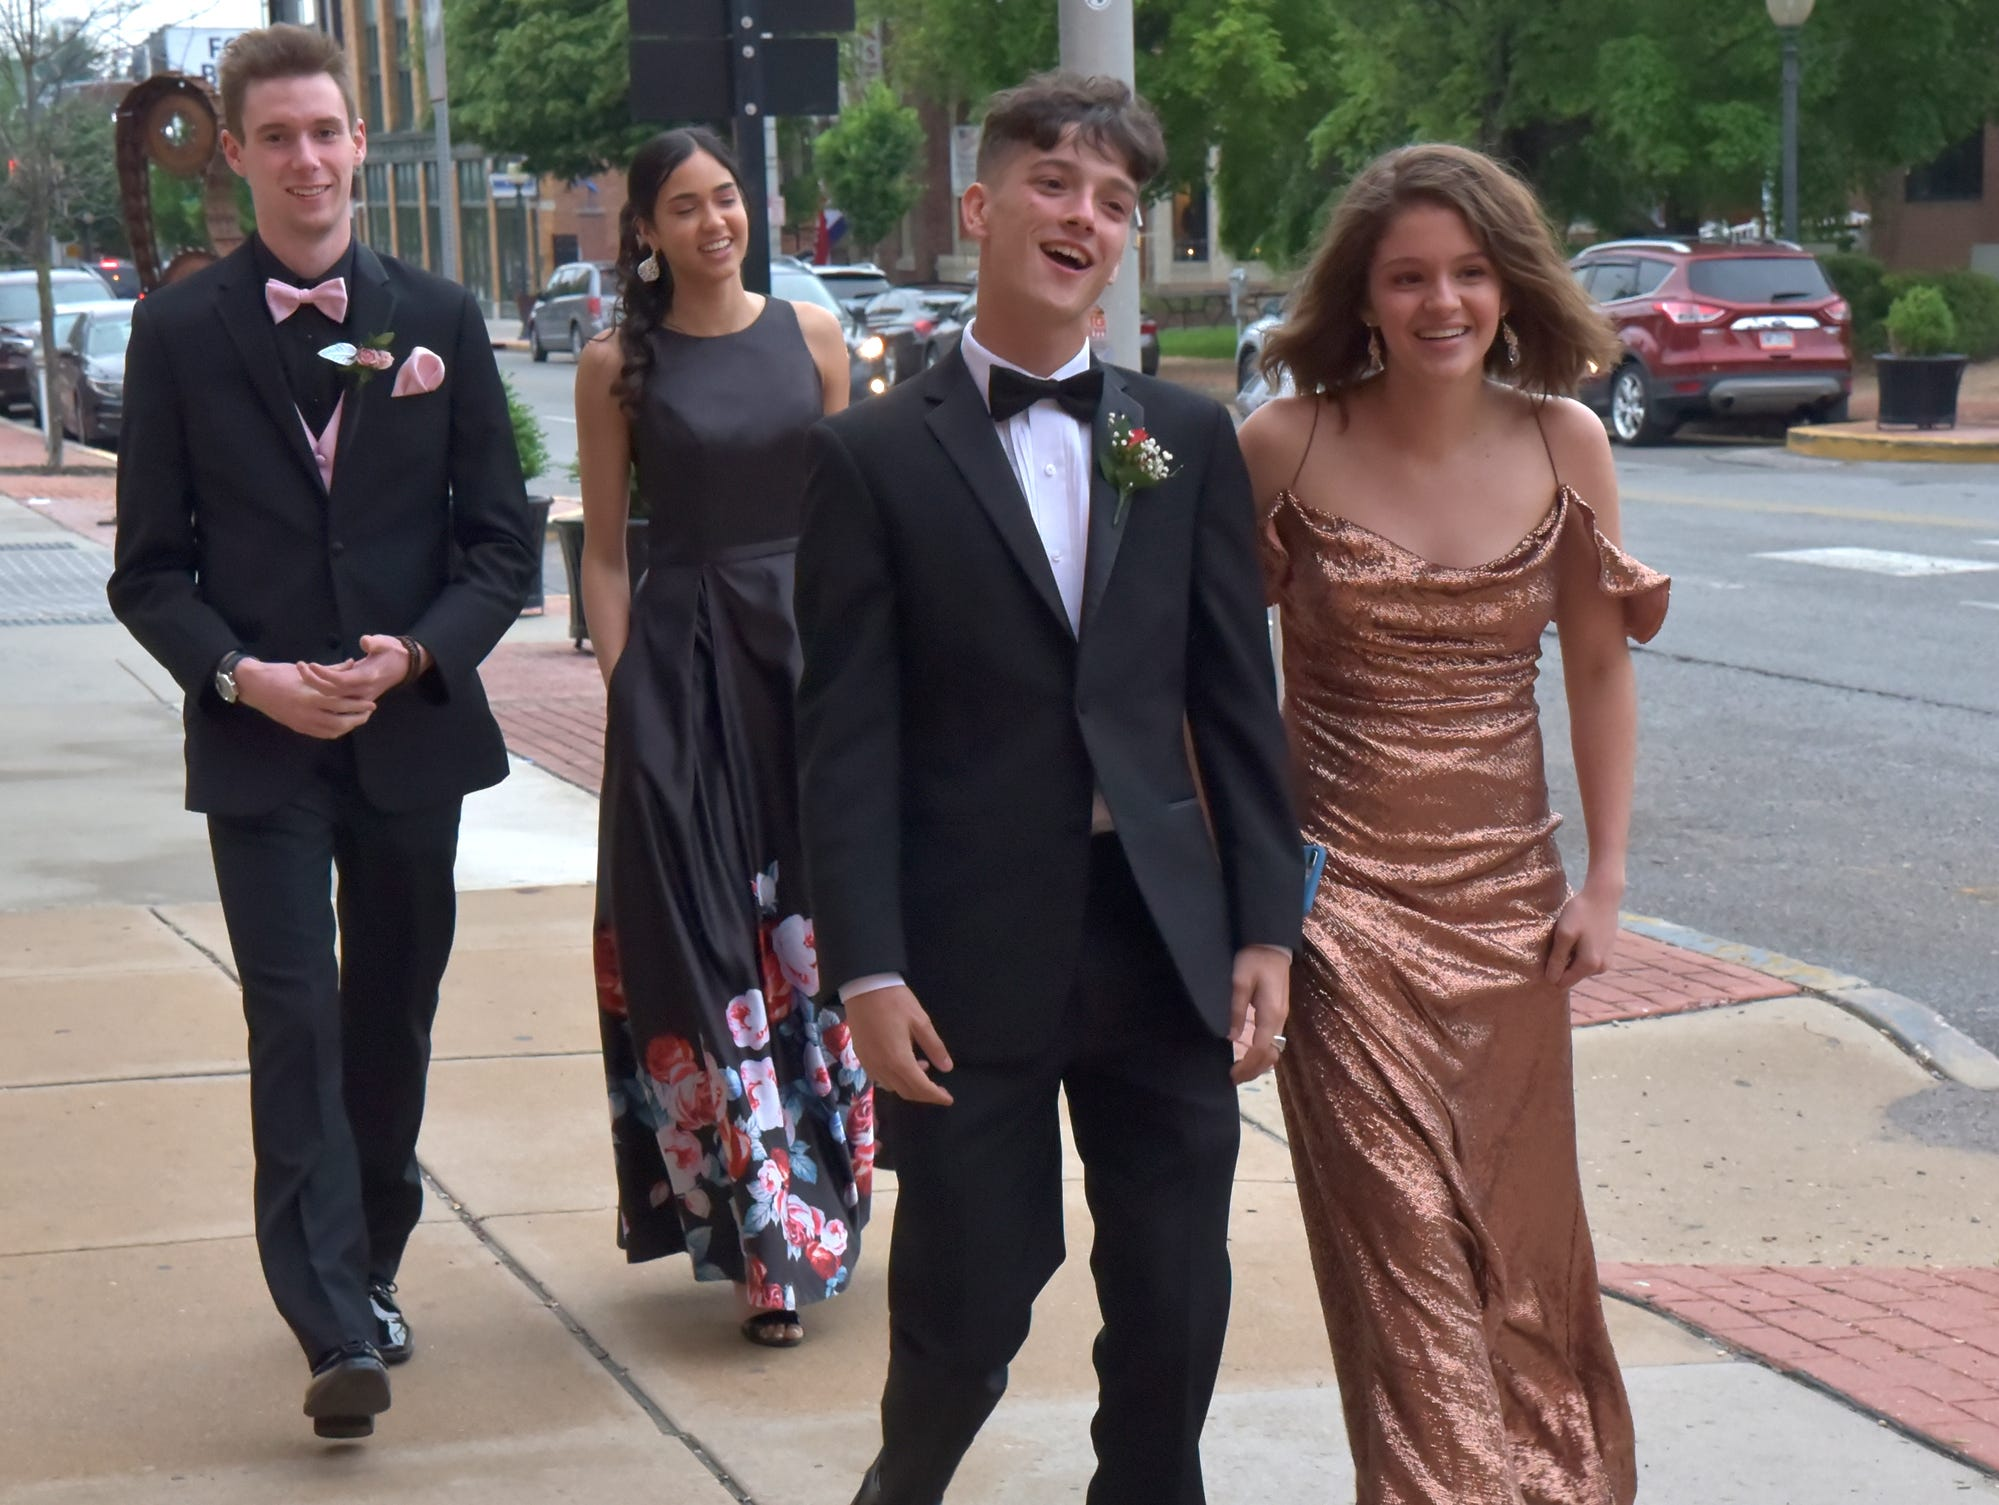 York Suburban Trojans celebrated their 2019 prom Saturday, May 11, at the Valencia Ballroom. Randy Flaum photo